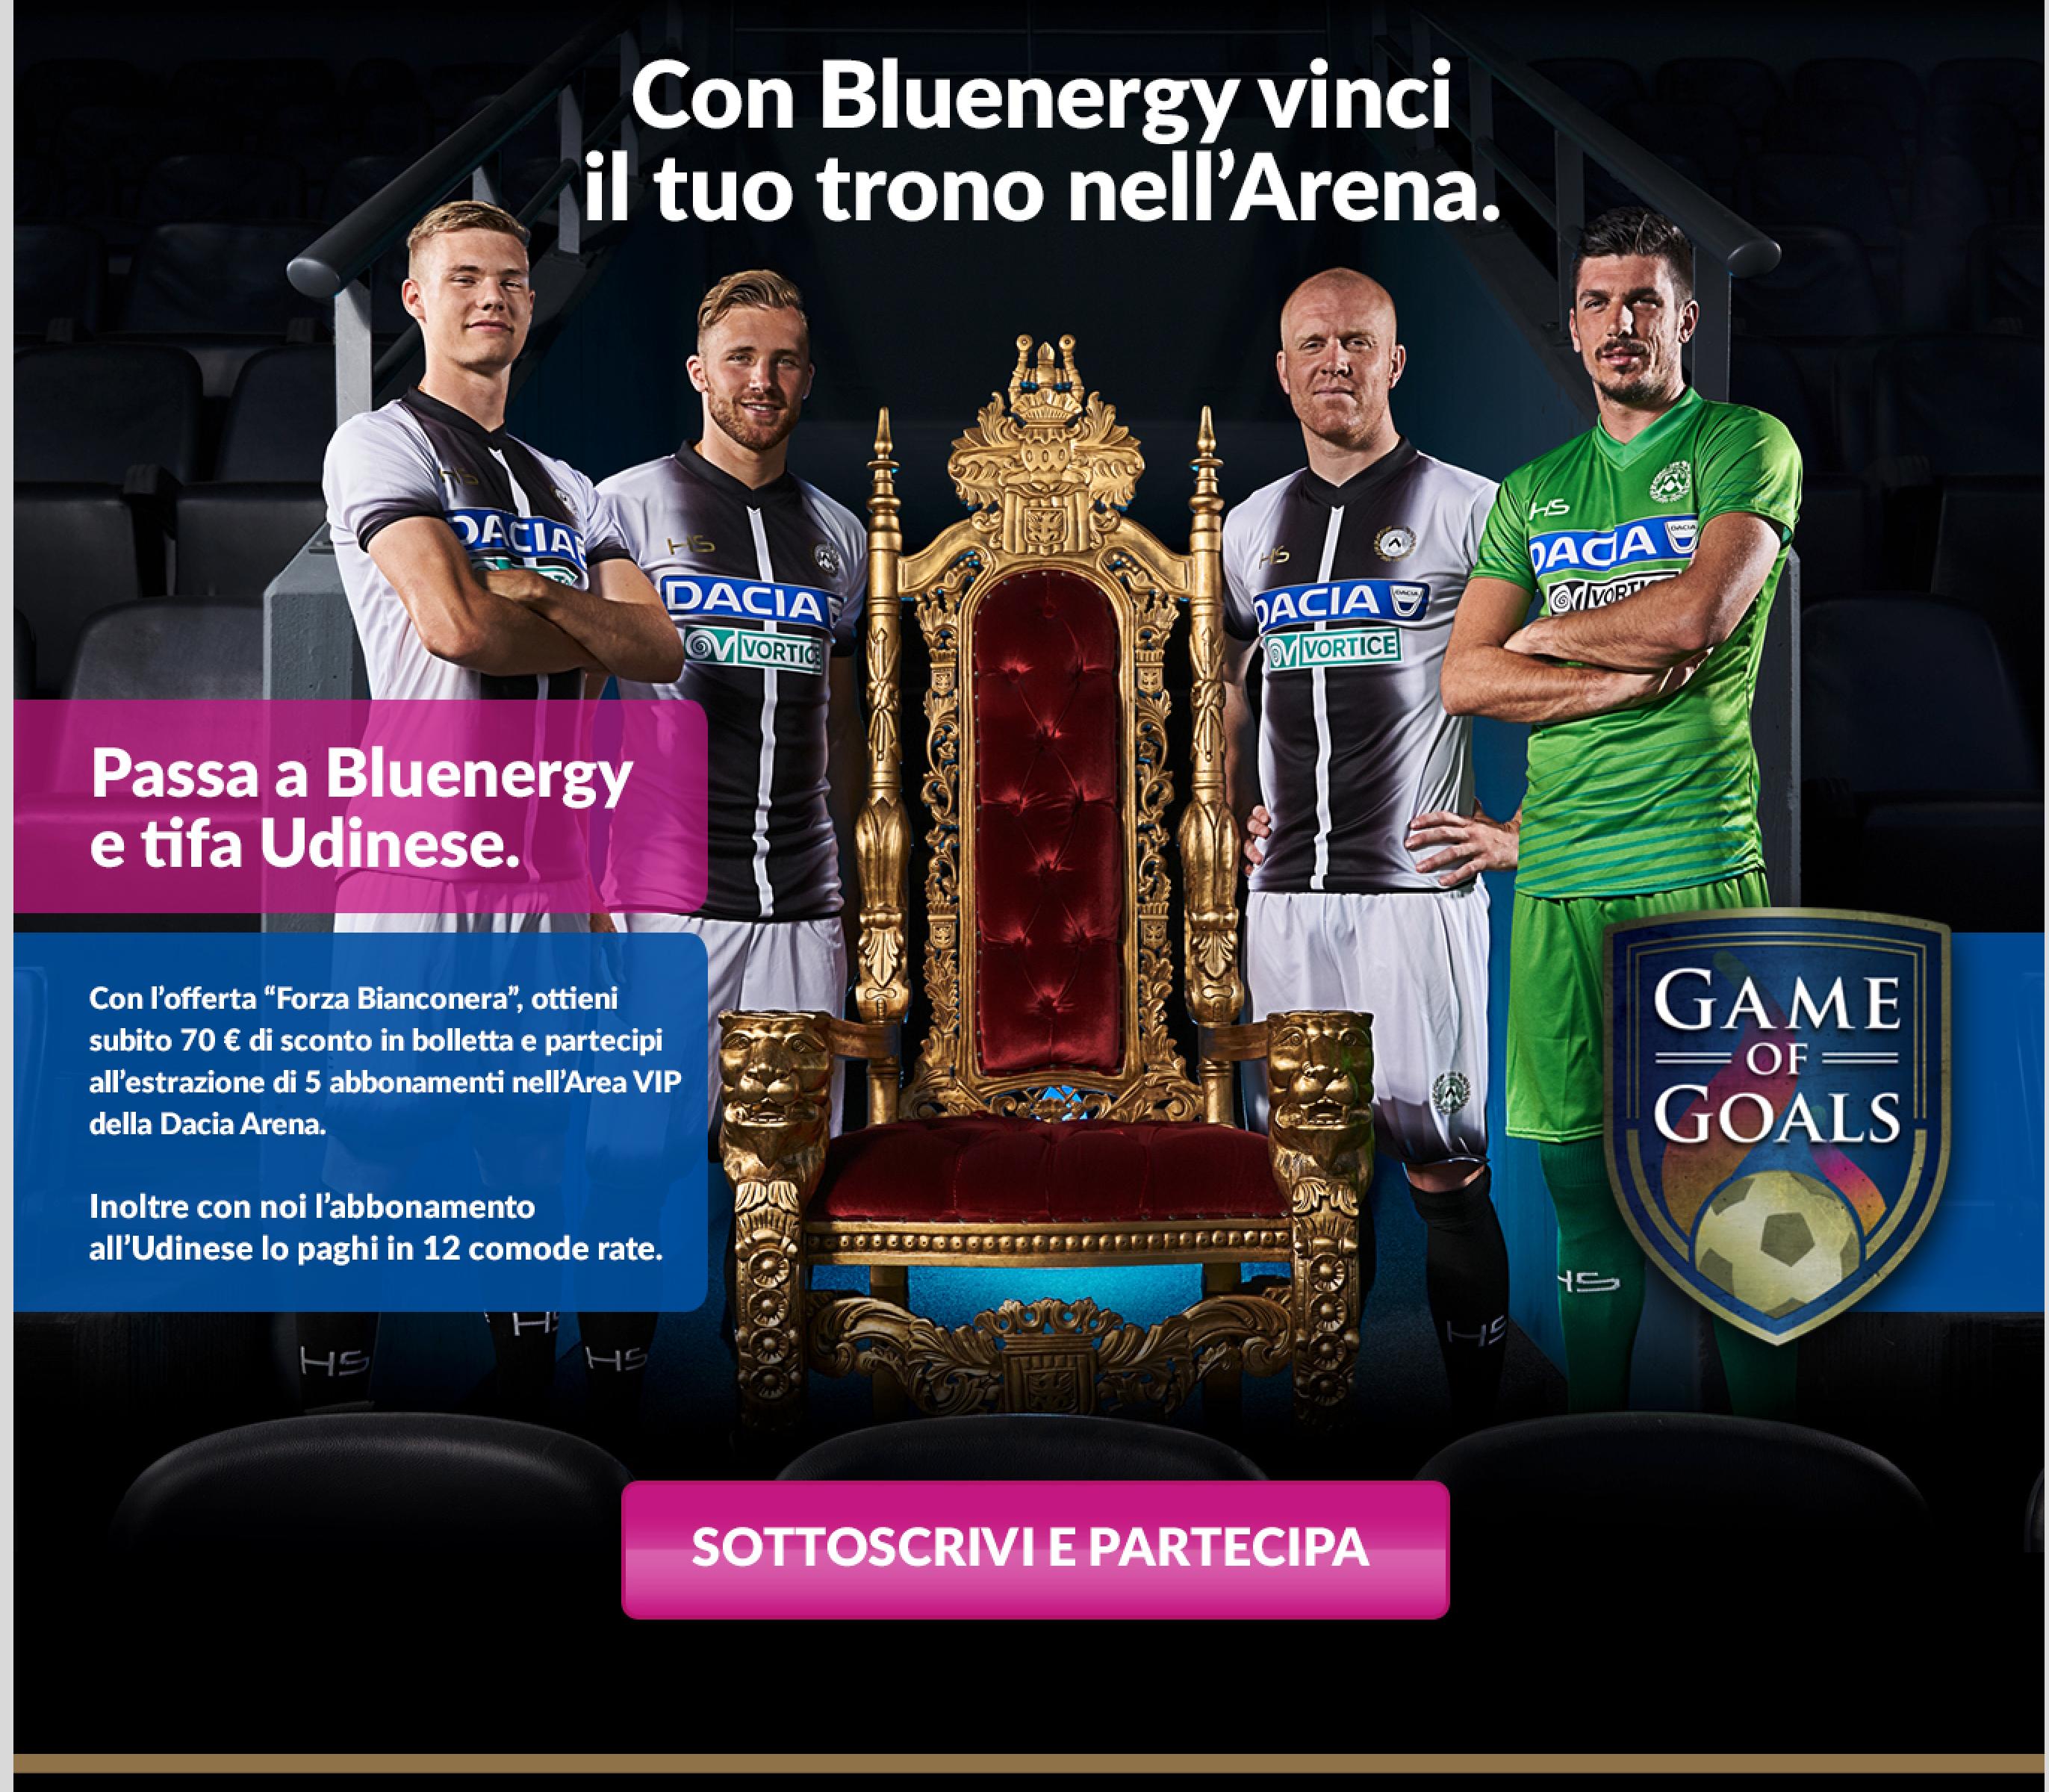 Bluenergy diventa Premium Partner e Energy Partner di Udinese Calcio